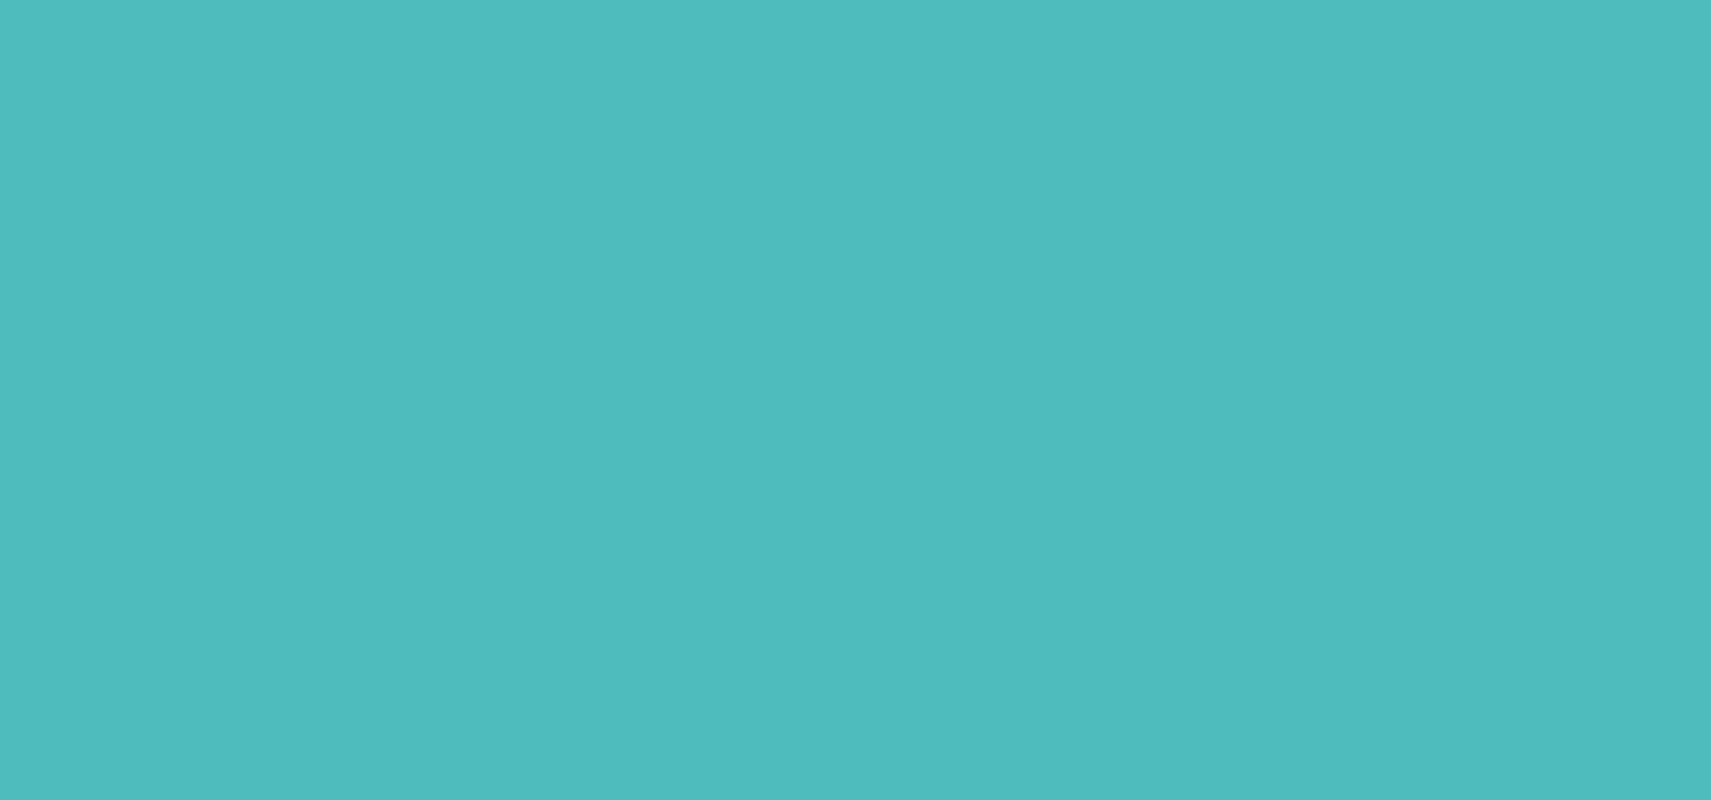 Aduis Acryliic acrylverf - 500 ml, turkoois